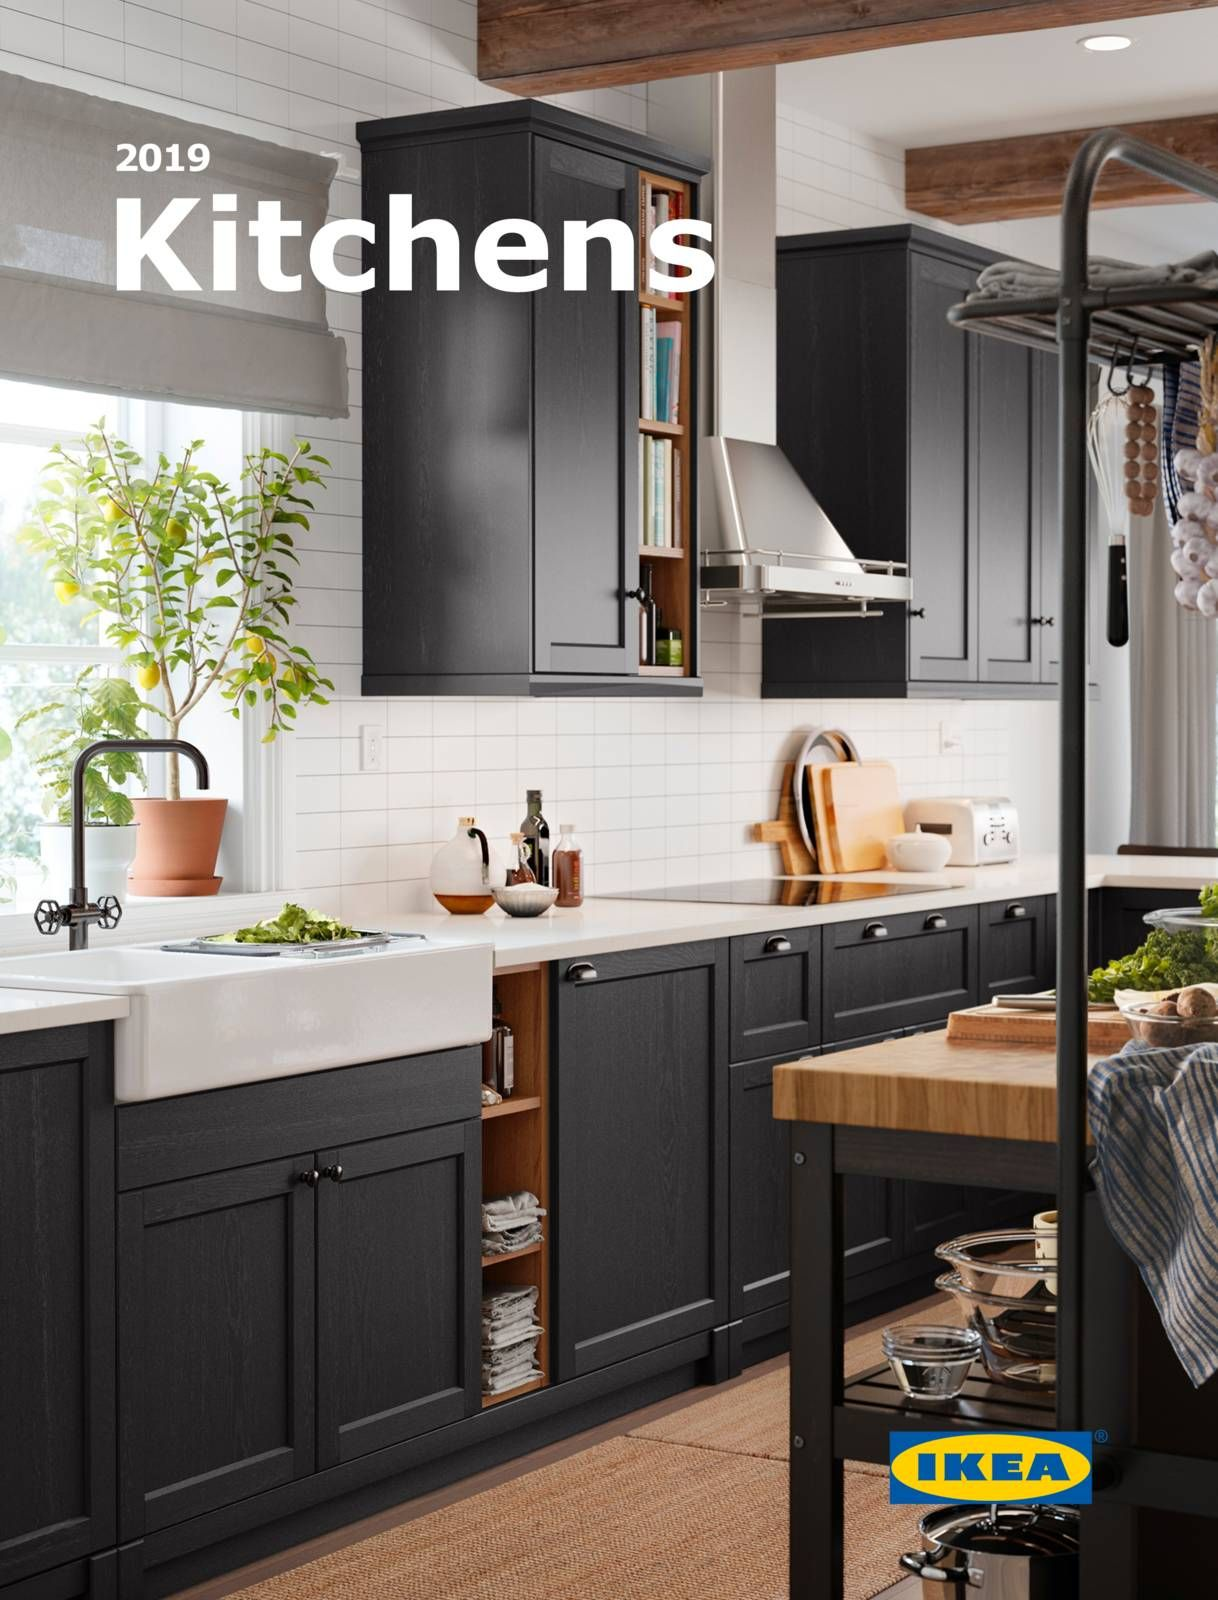 Kitchens 2019 Ikea Kitchen Brochure 2019 Black Ikea Kitchen